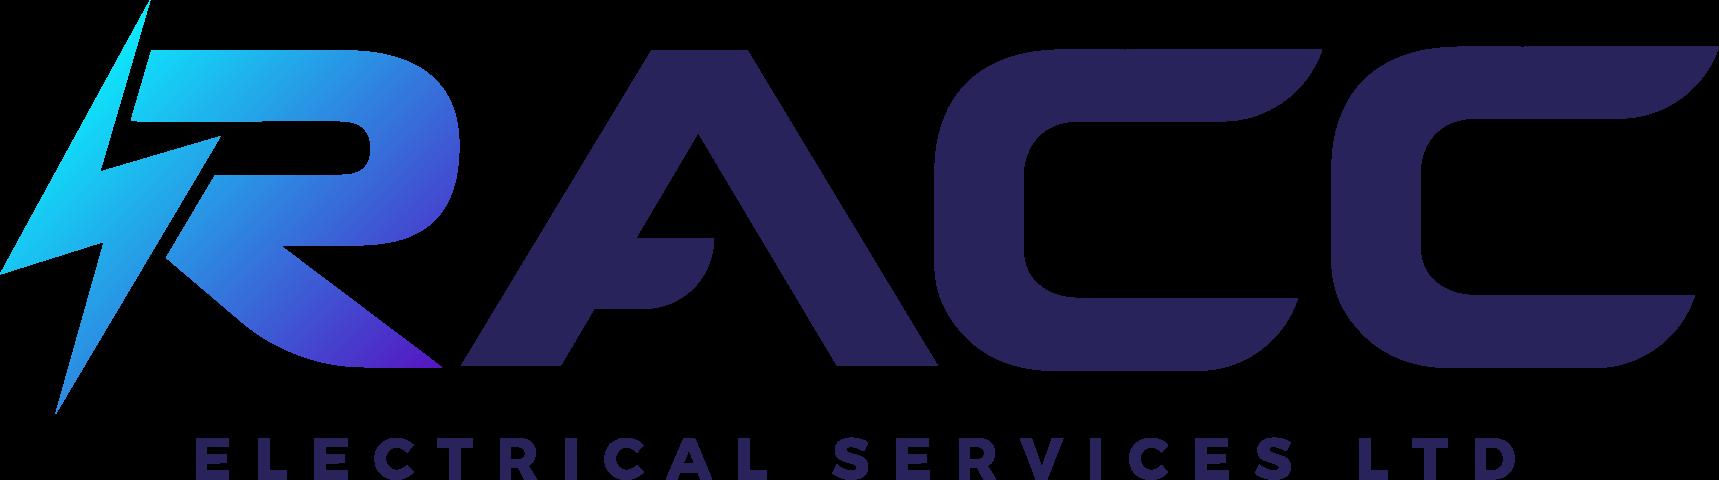 RACC Electrical Services Ltd